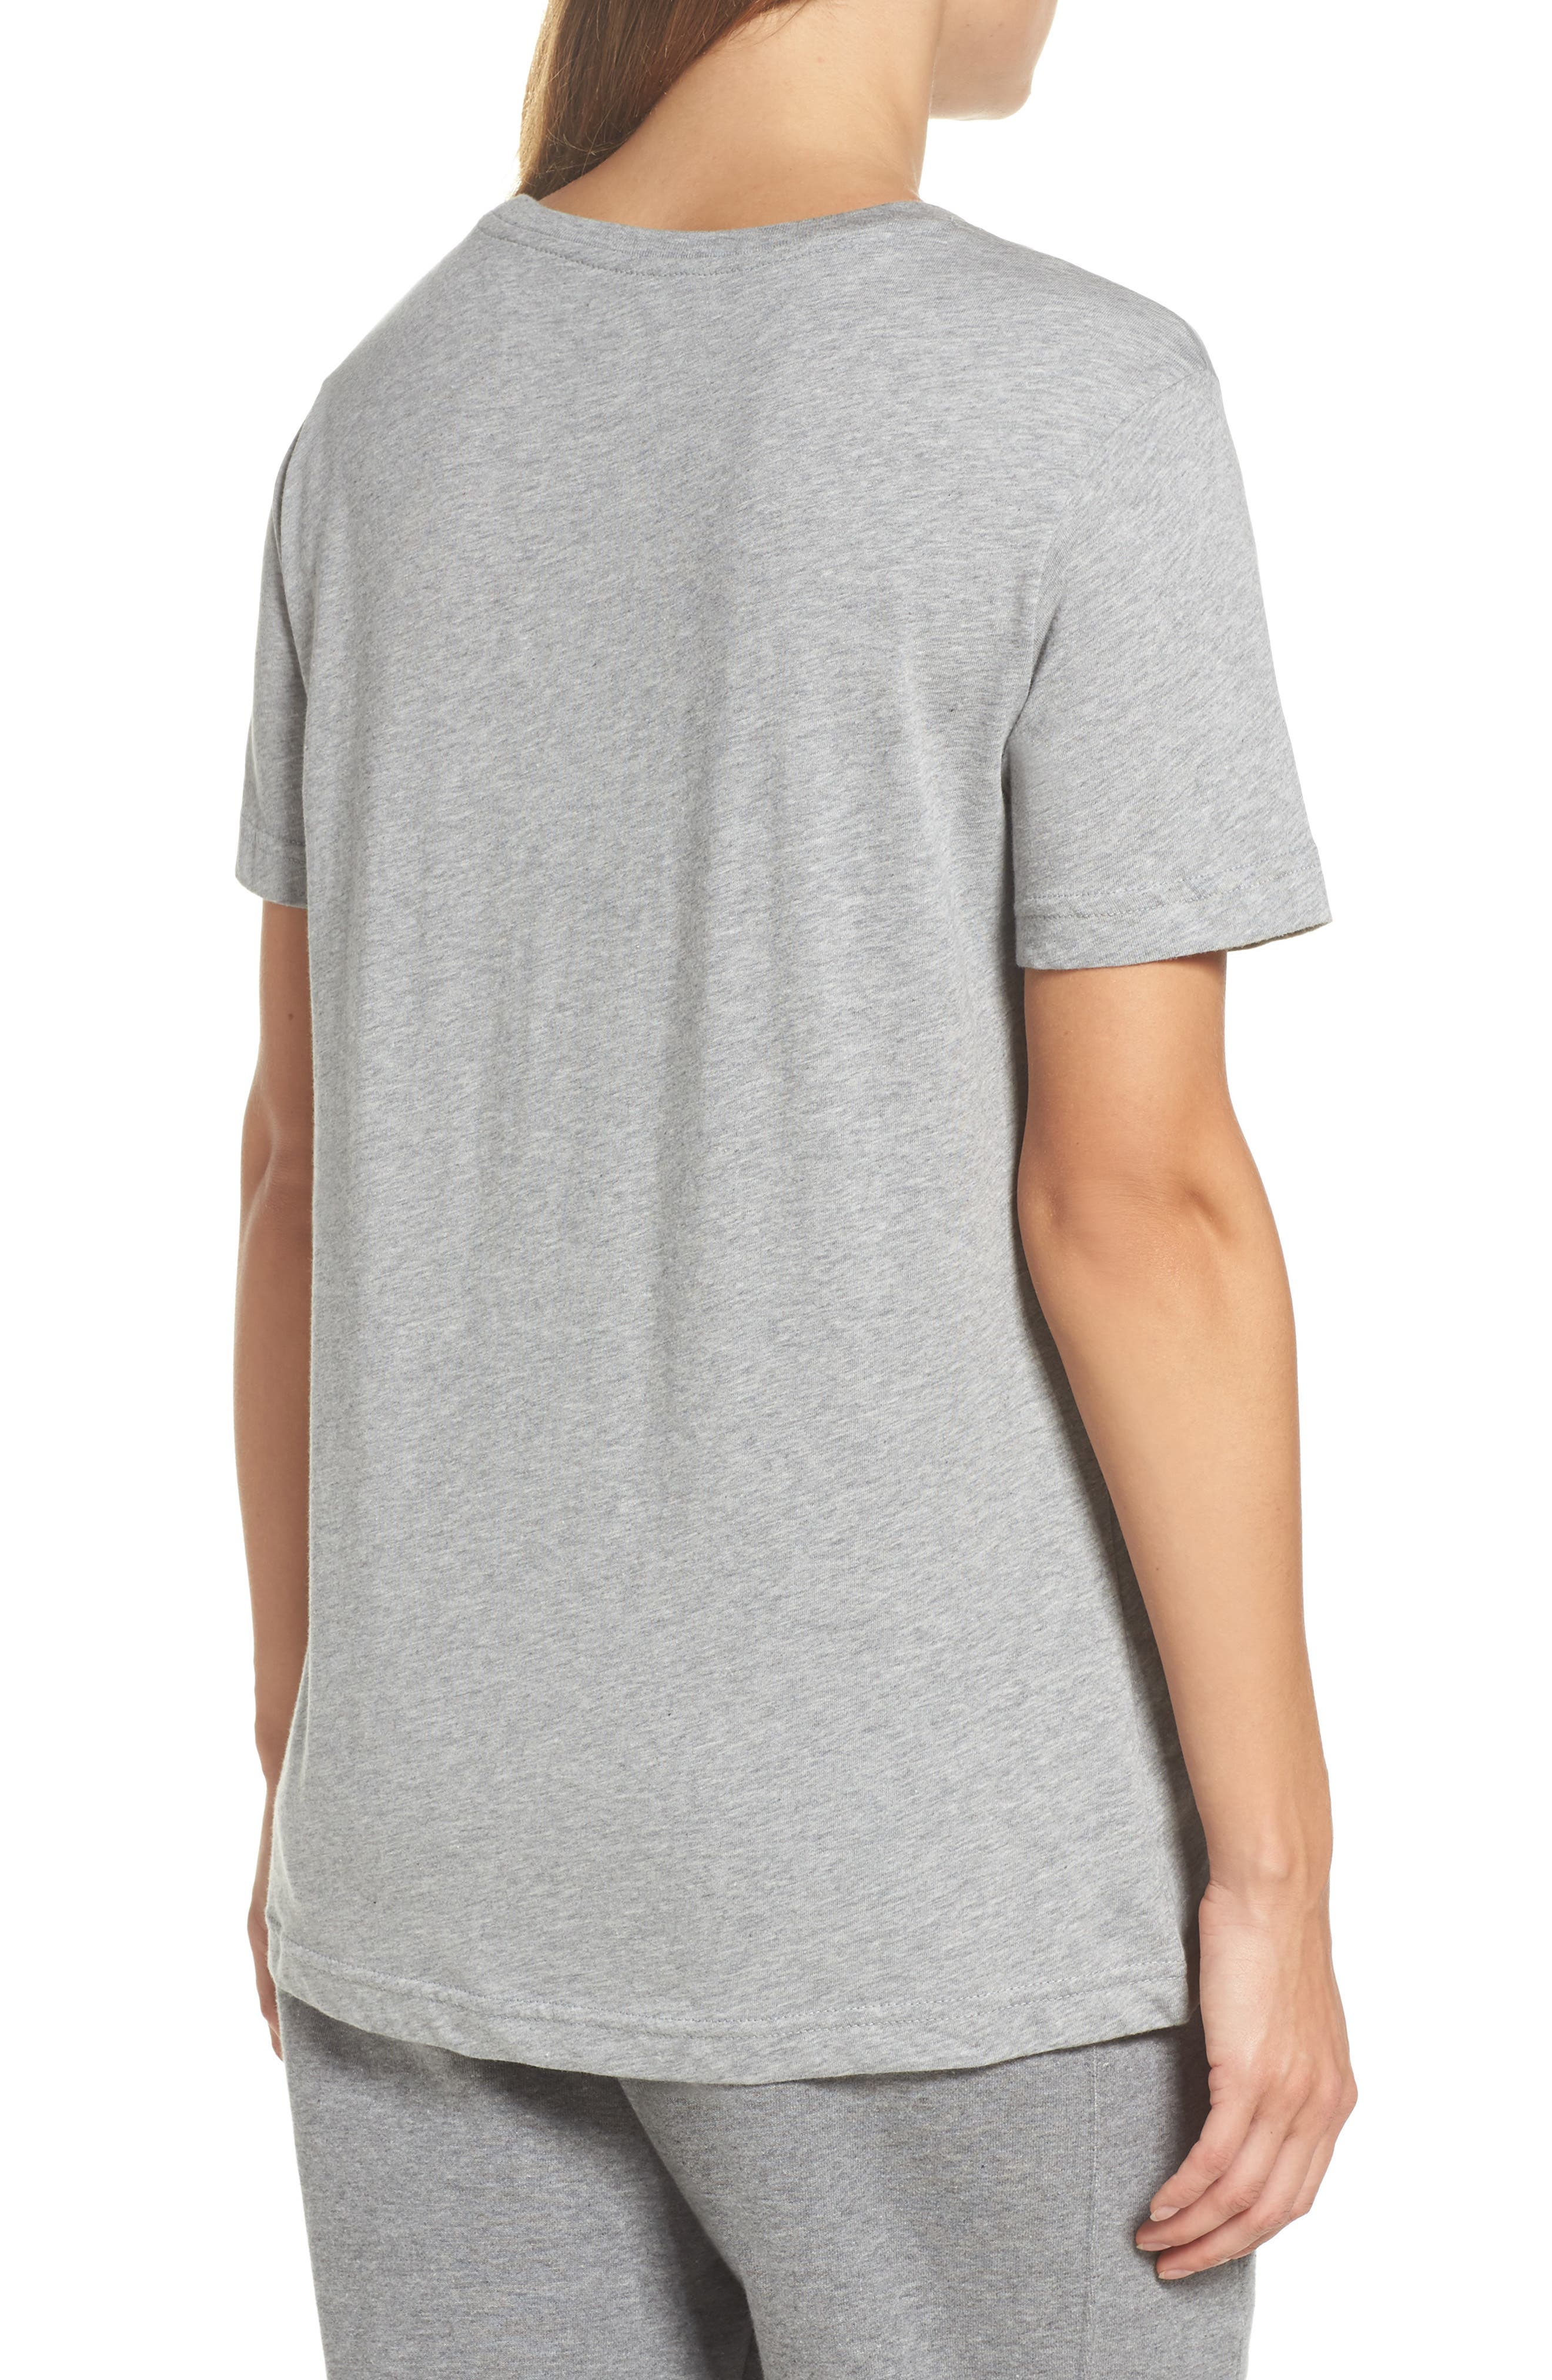 Sportswear Goddess Graphic Tee,                             Alternate thumbnail 2, color,                             Dark Grey Heather/ Black